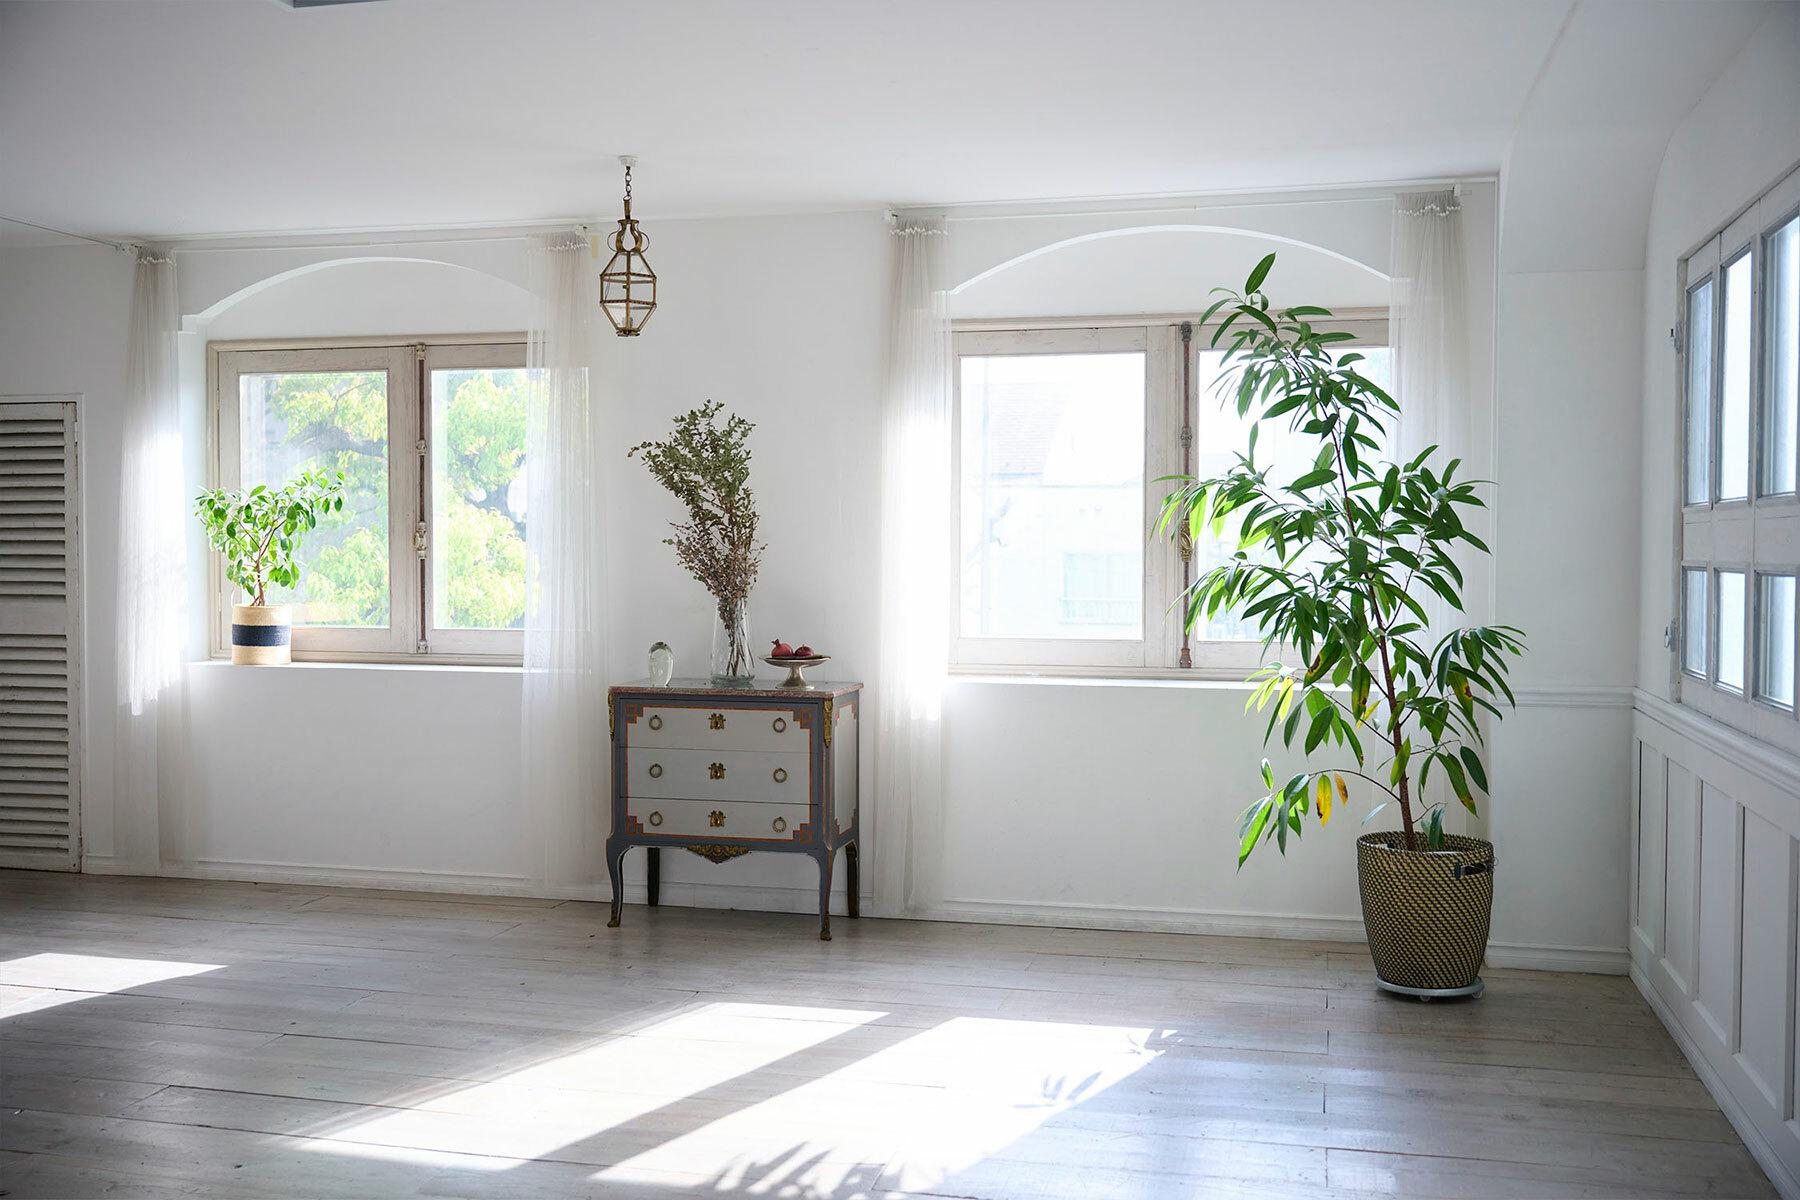 STUDIO FOGLIA 2st (スタジオ フォグリア 2st)広々家具の撮影にも